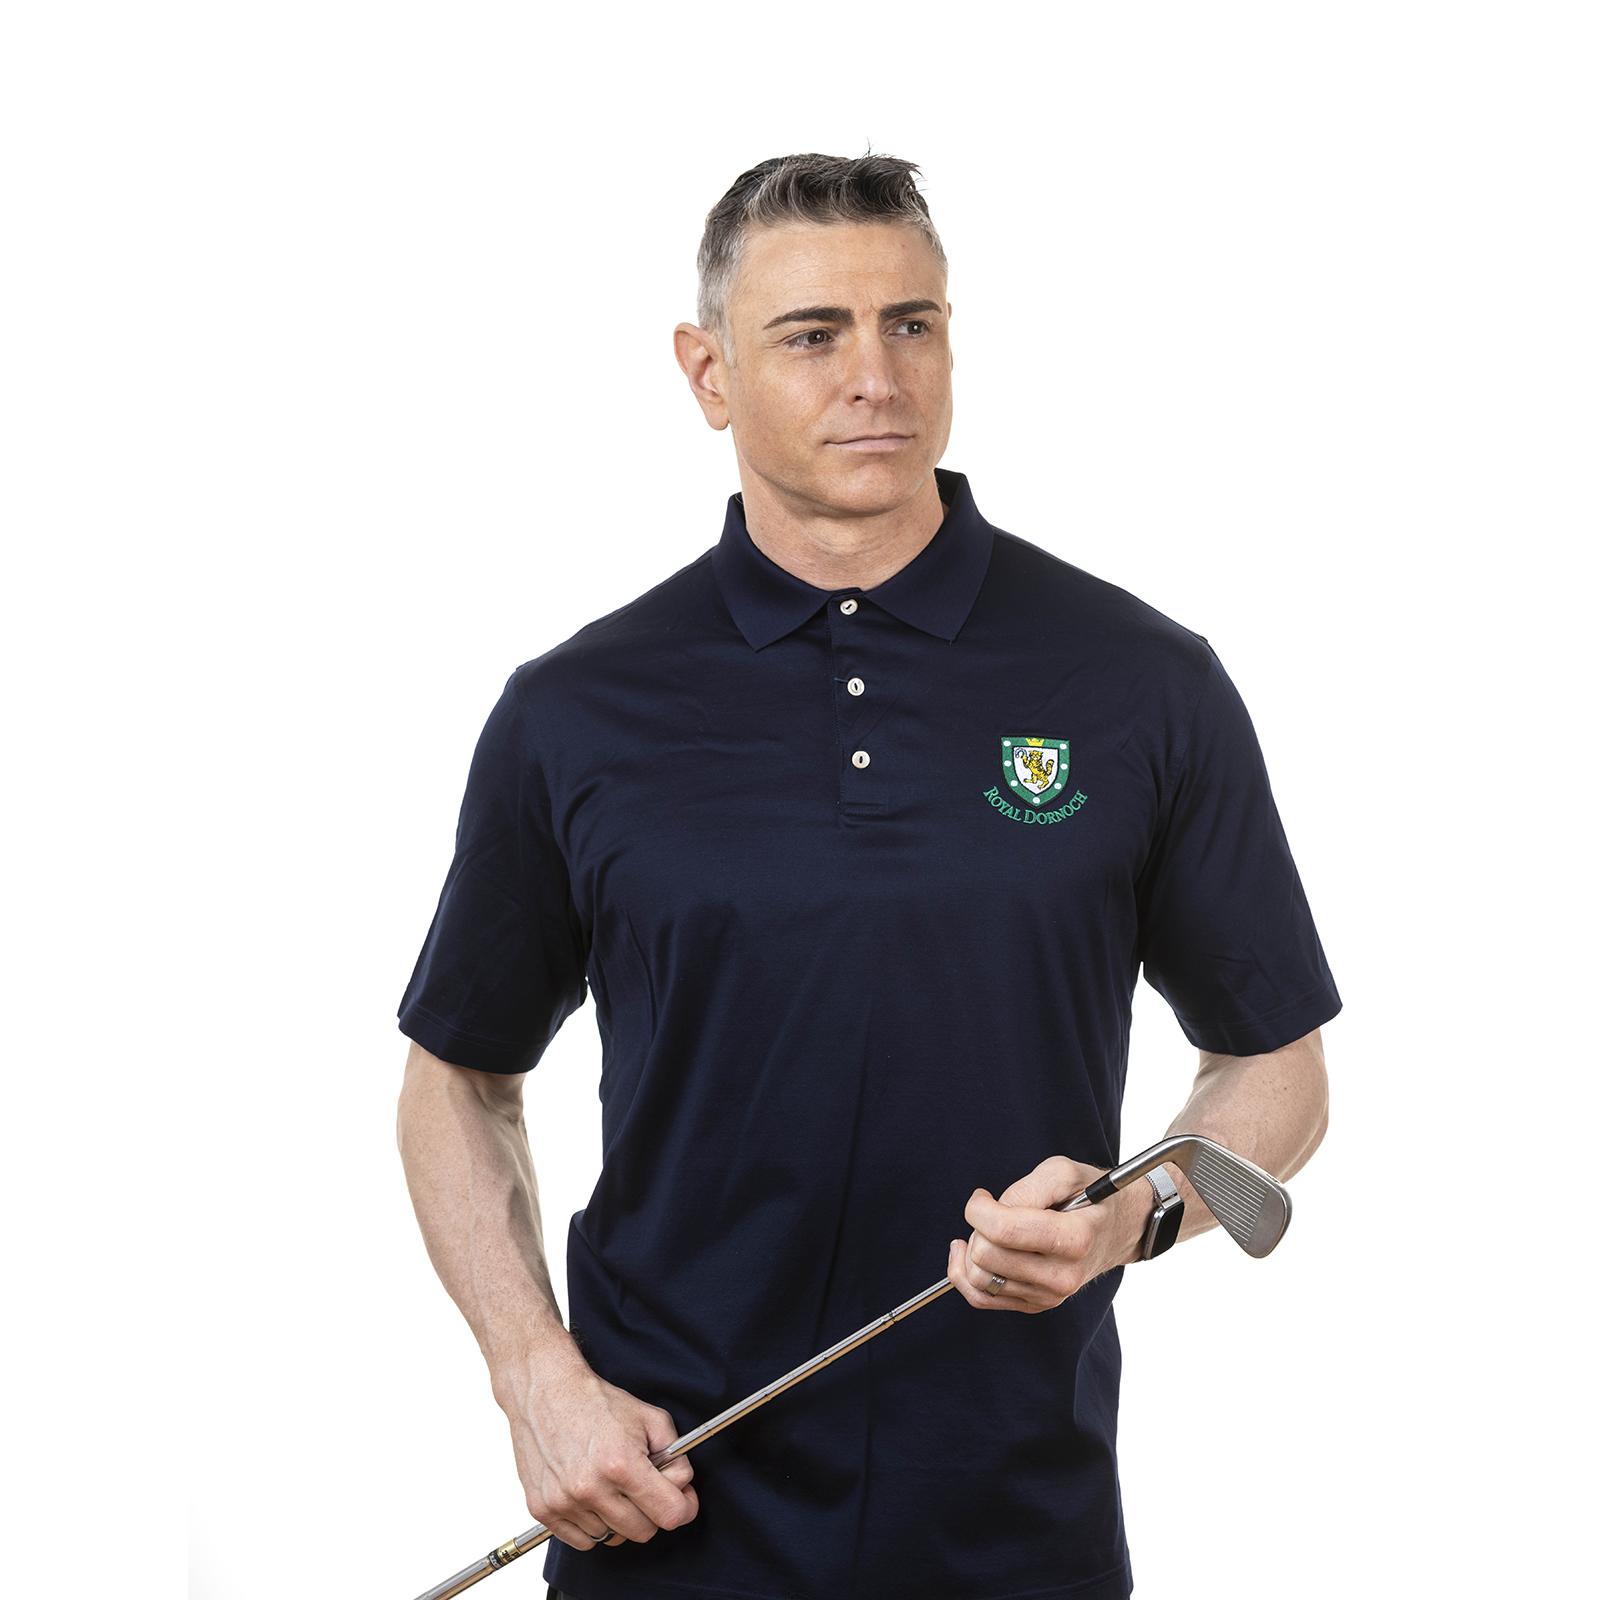 Peter Millar Solid Cotton Polo Shirt Royal Dornoch Pro Shop